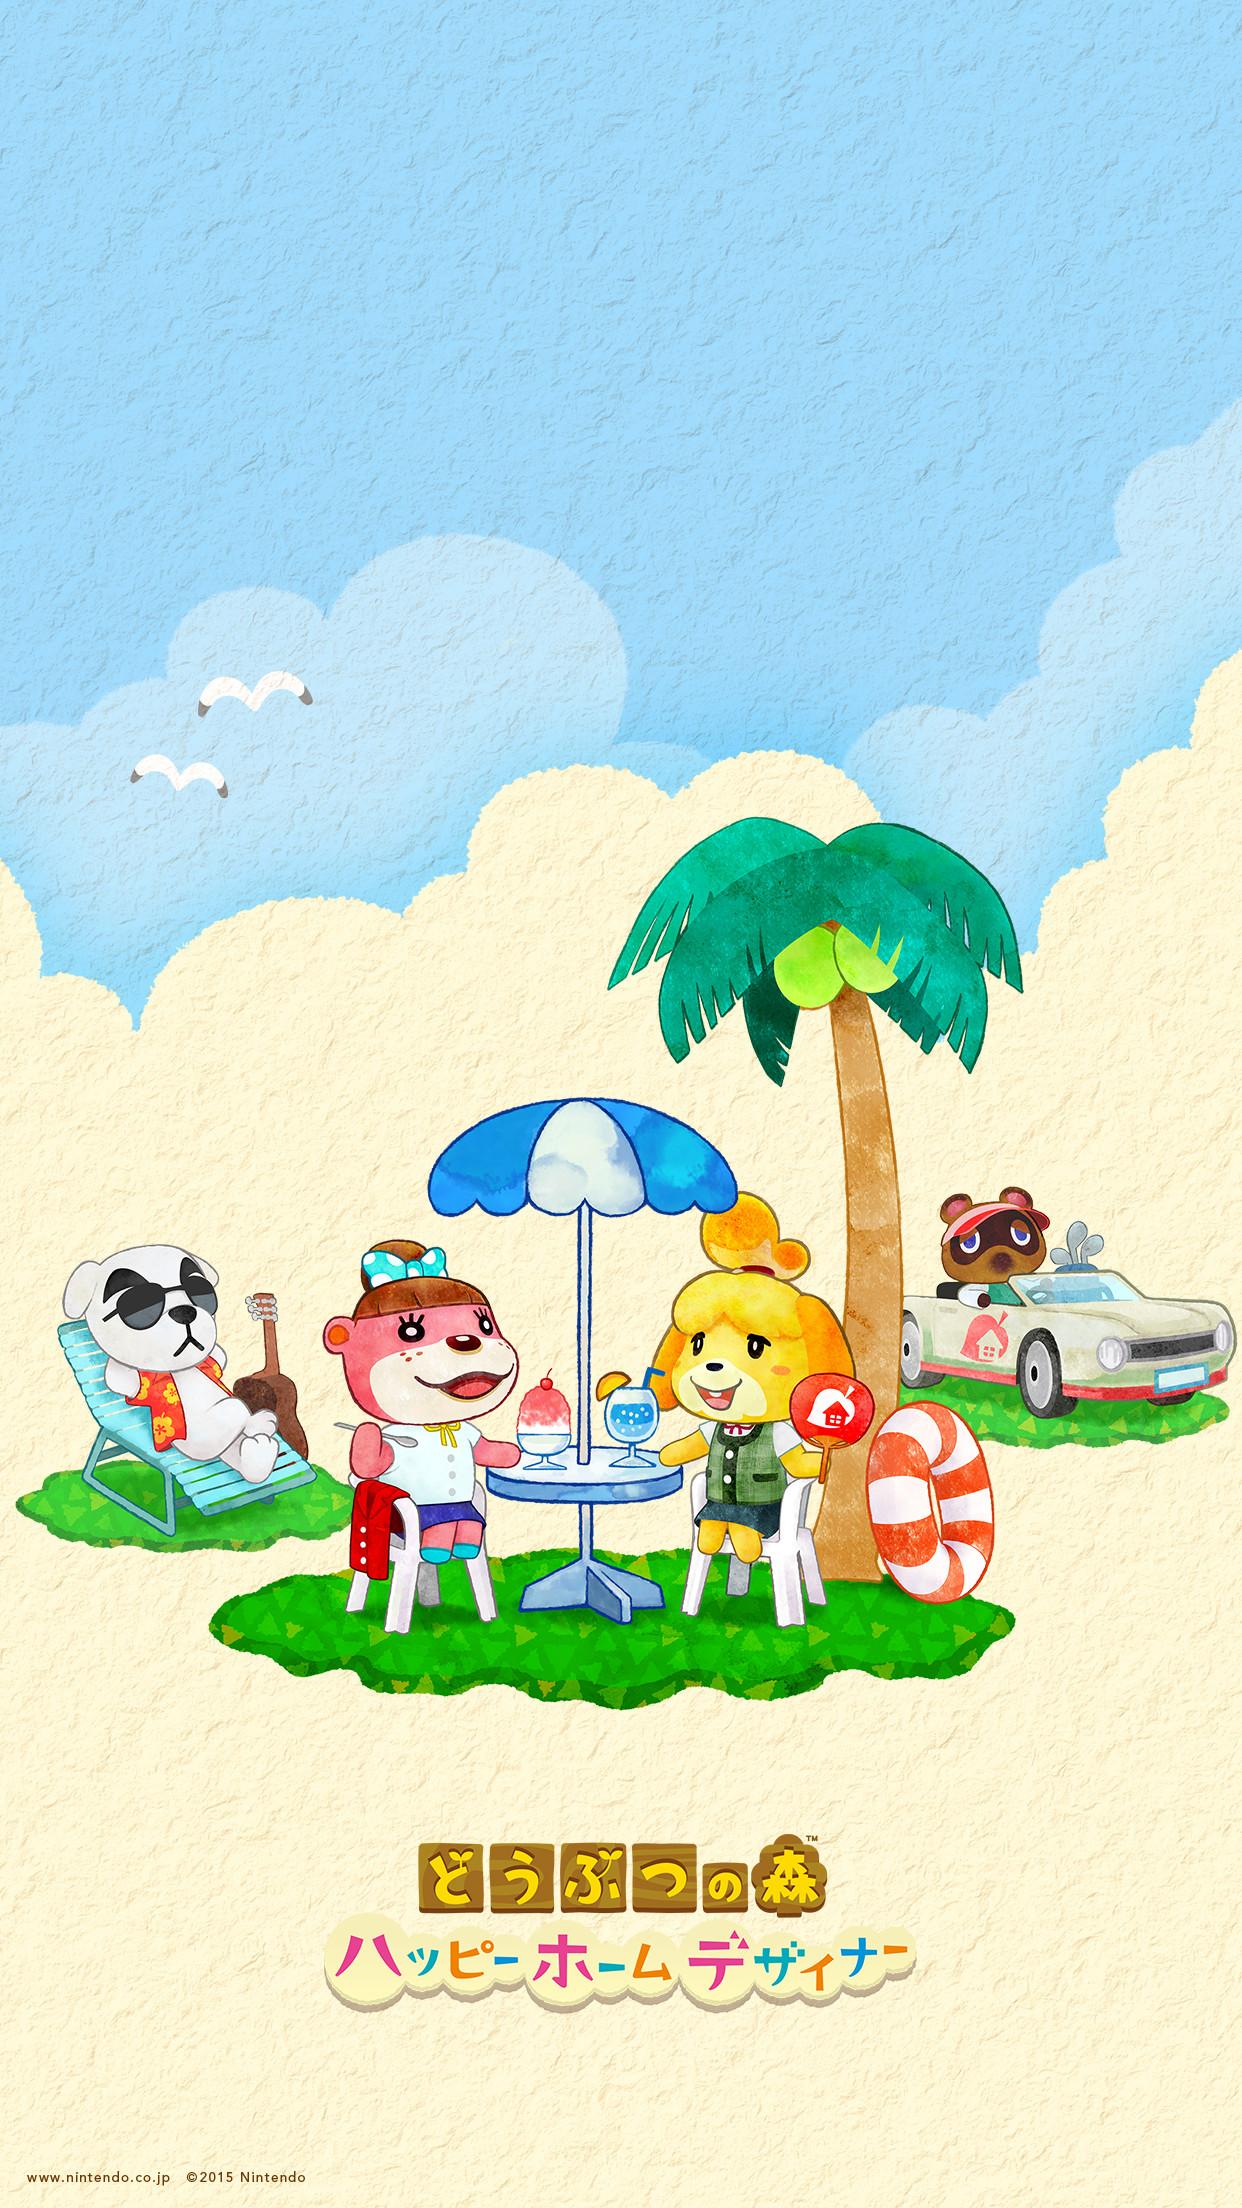 66 Animal Crossing Iphone